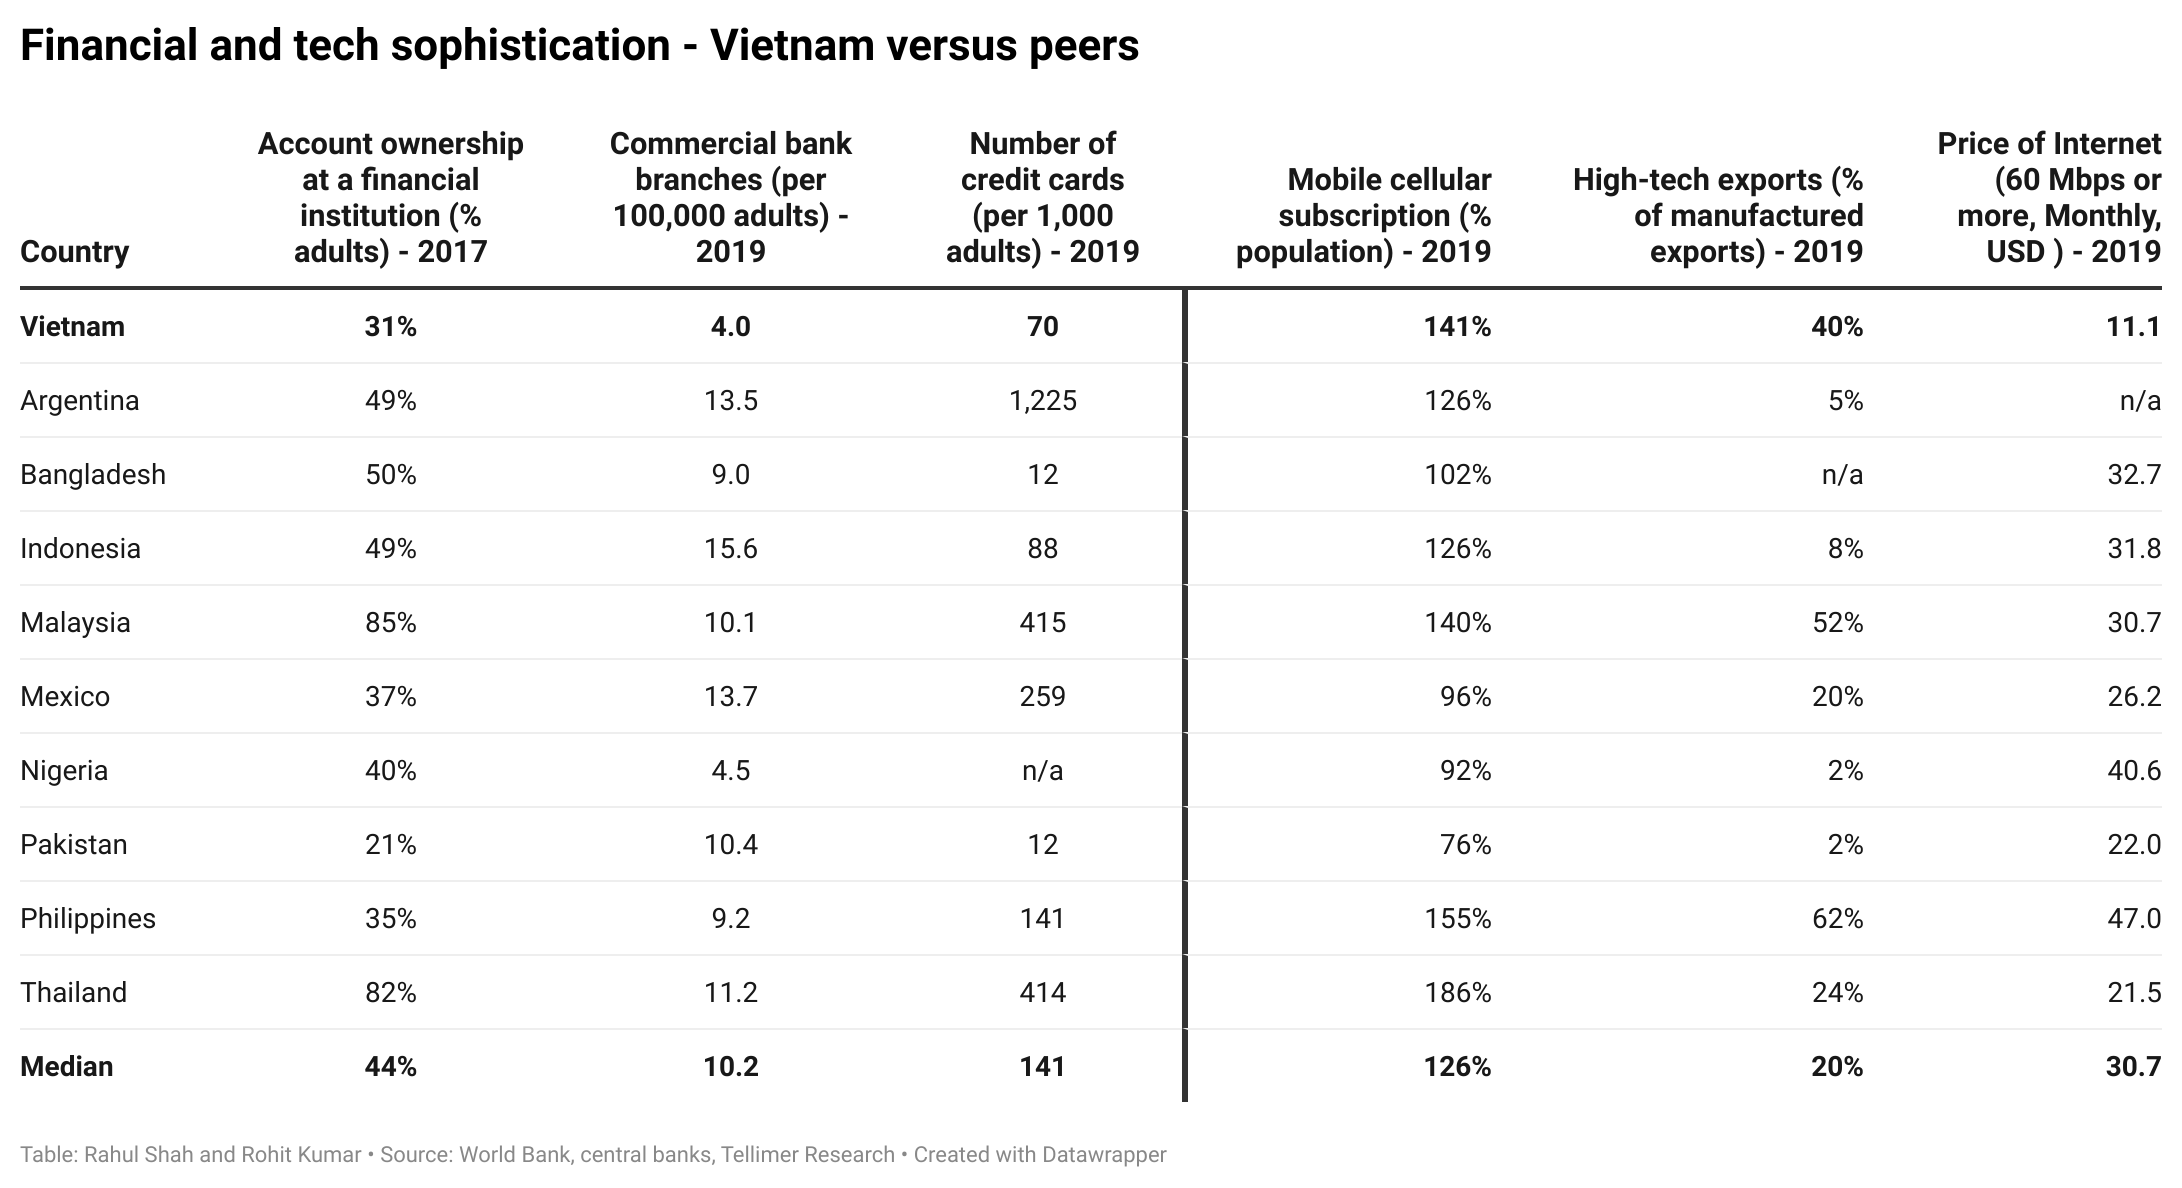 Financial and tech sophistication - Vietnam versus peers